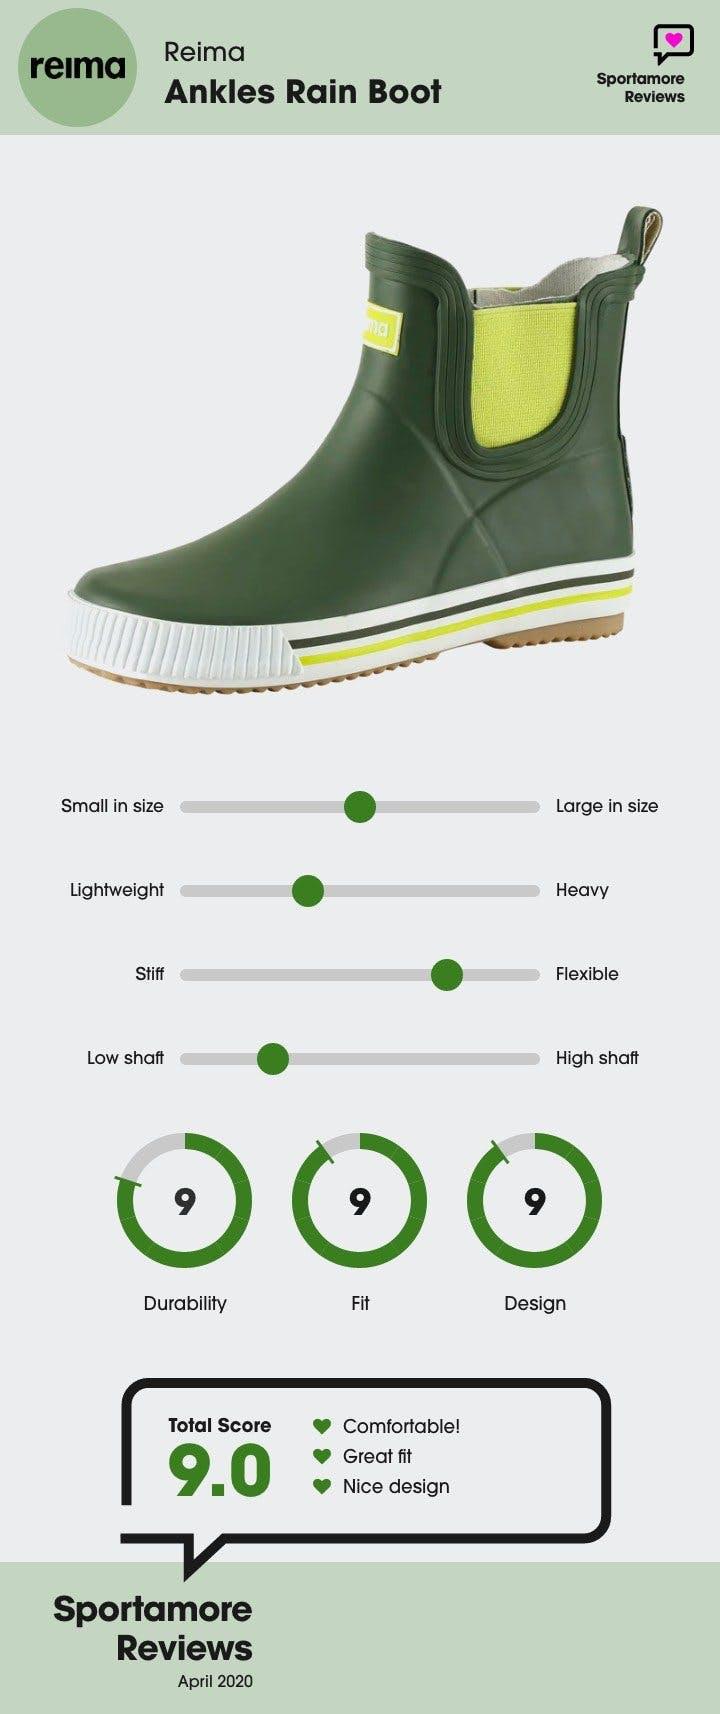 Reima Ankles Rain Boot.jpg